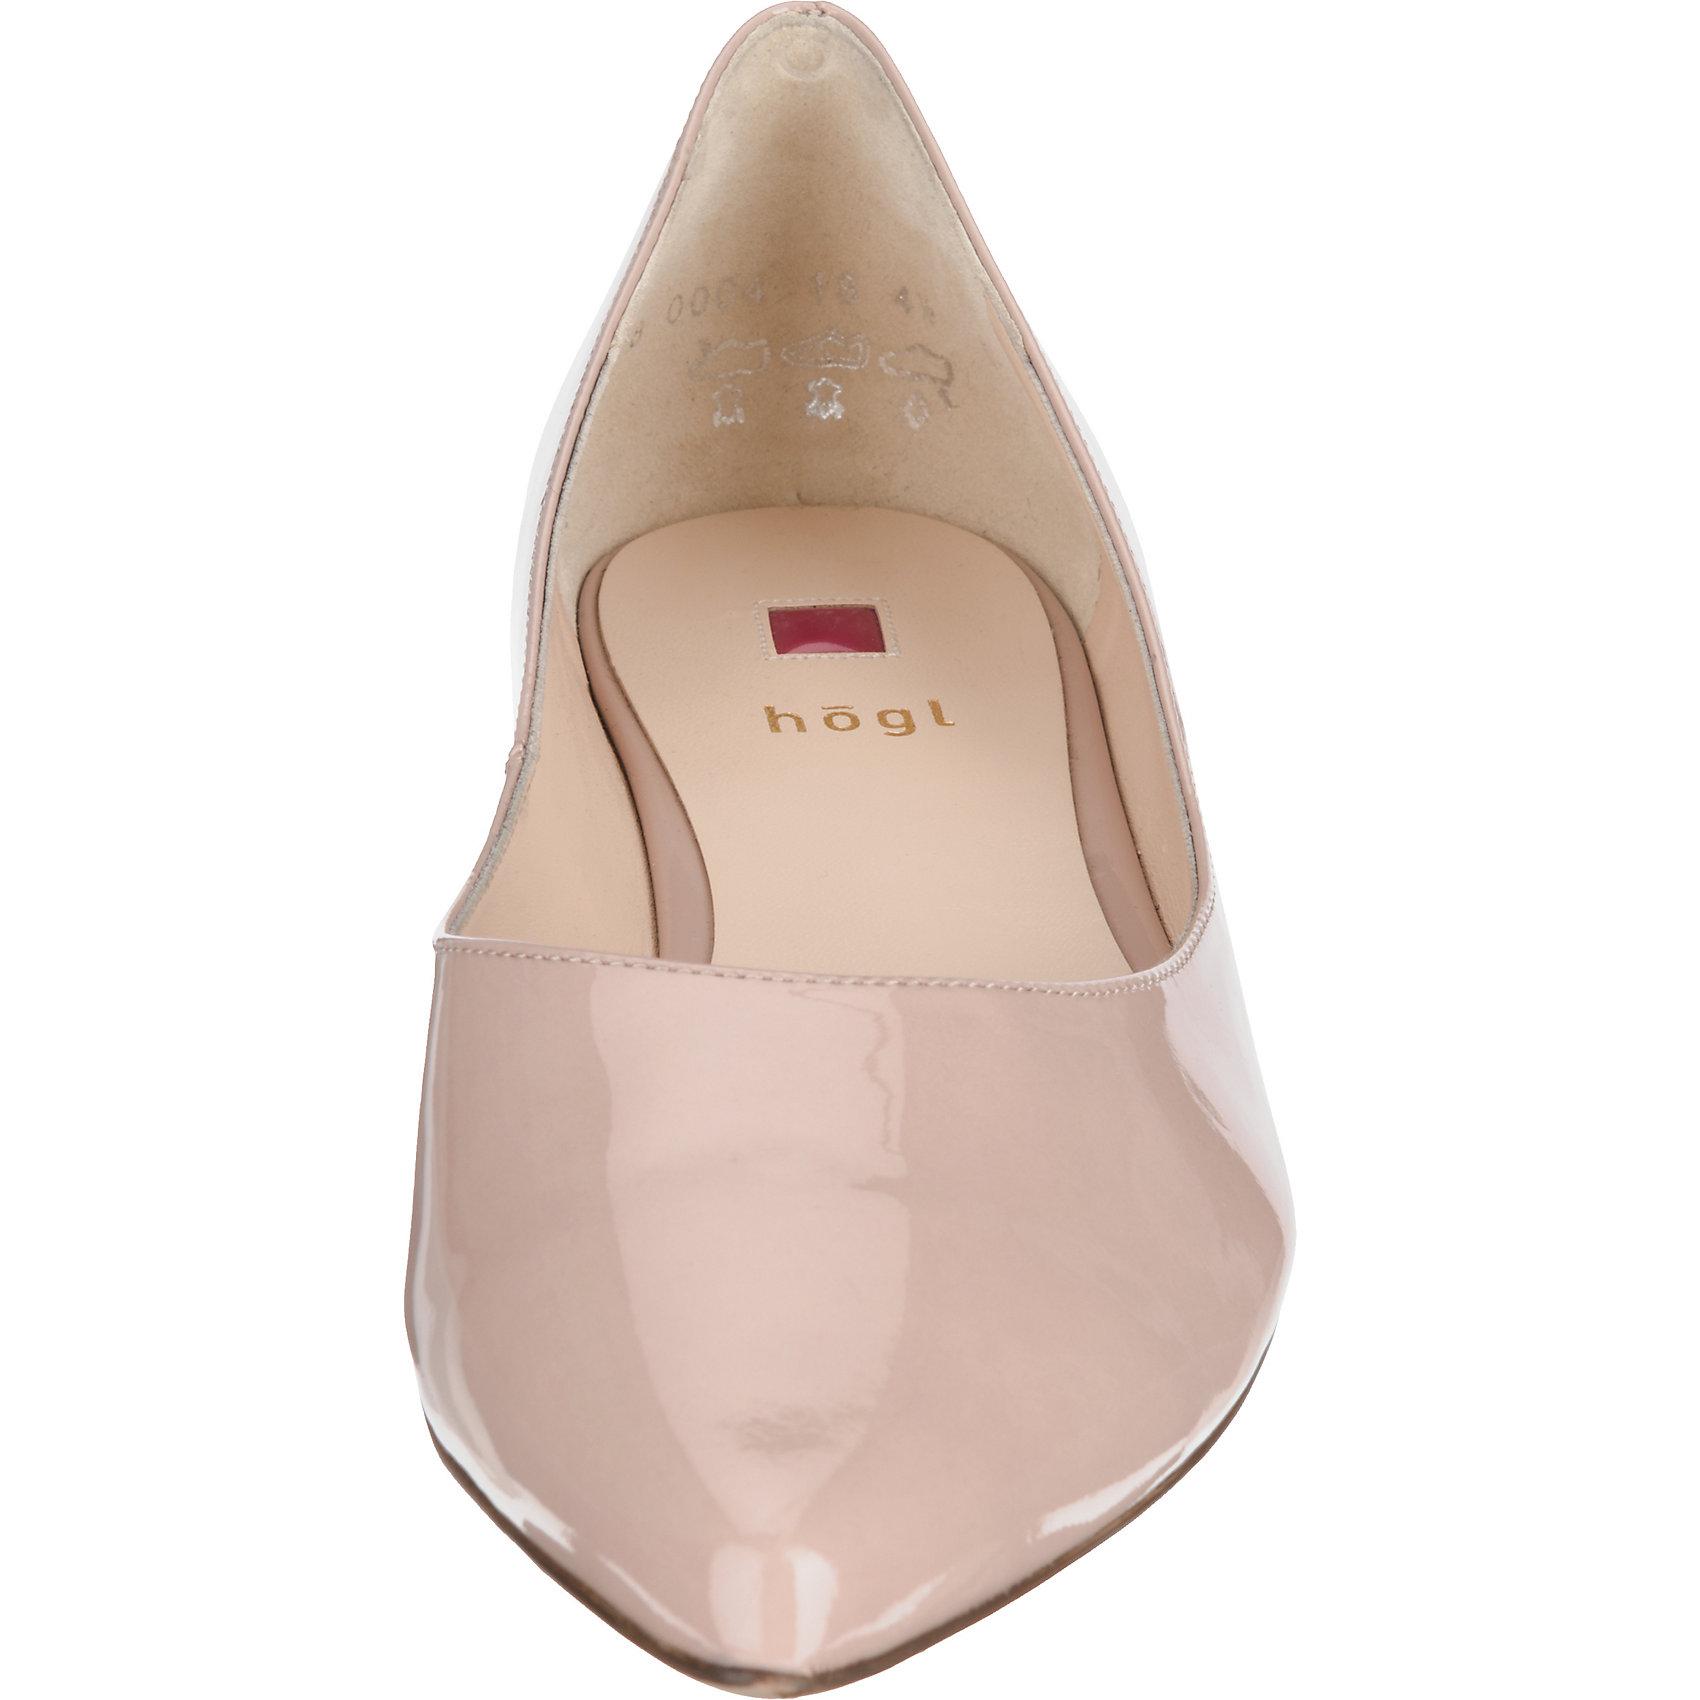 Neu Neu Neu högl Softlack Klassische Ballerinas 5758316 für Damen nude 27465c